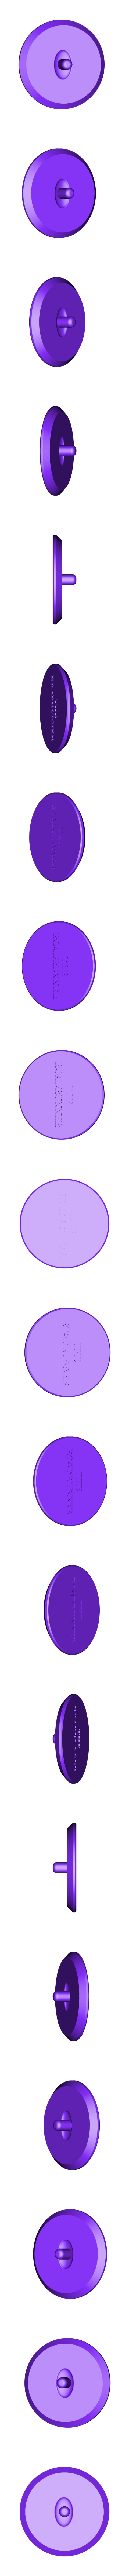 stand_circle.stl Download free STL file The Roadrunner • 3D printing object, ferjerez3d